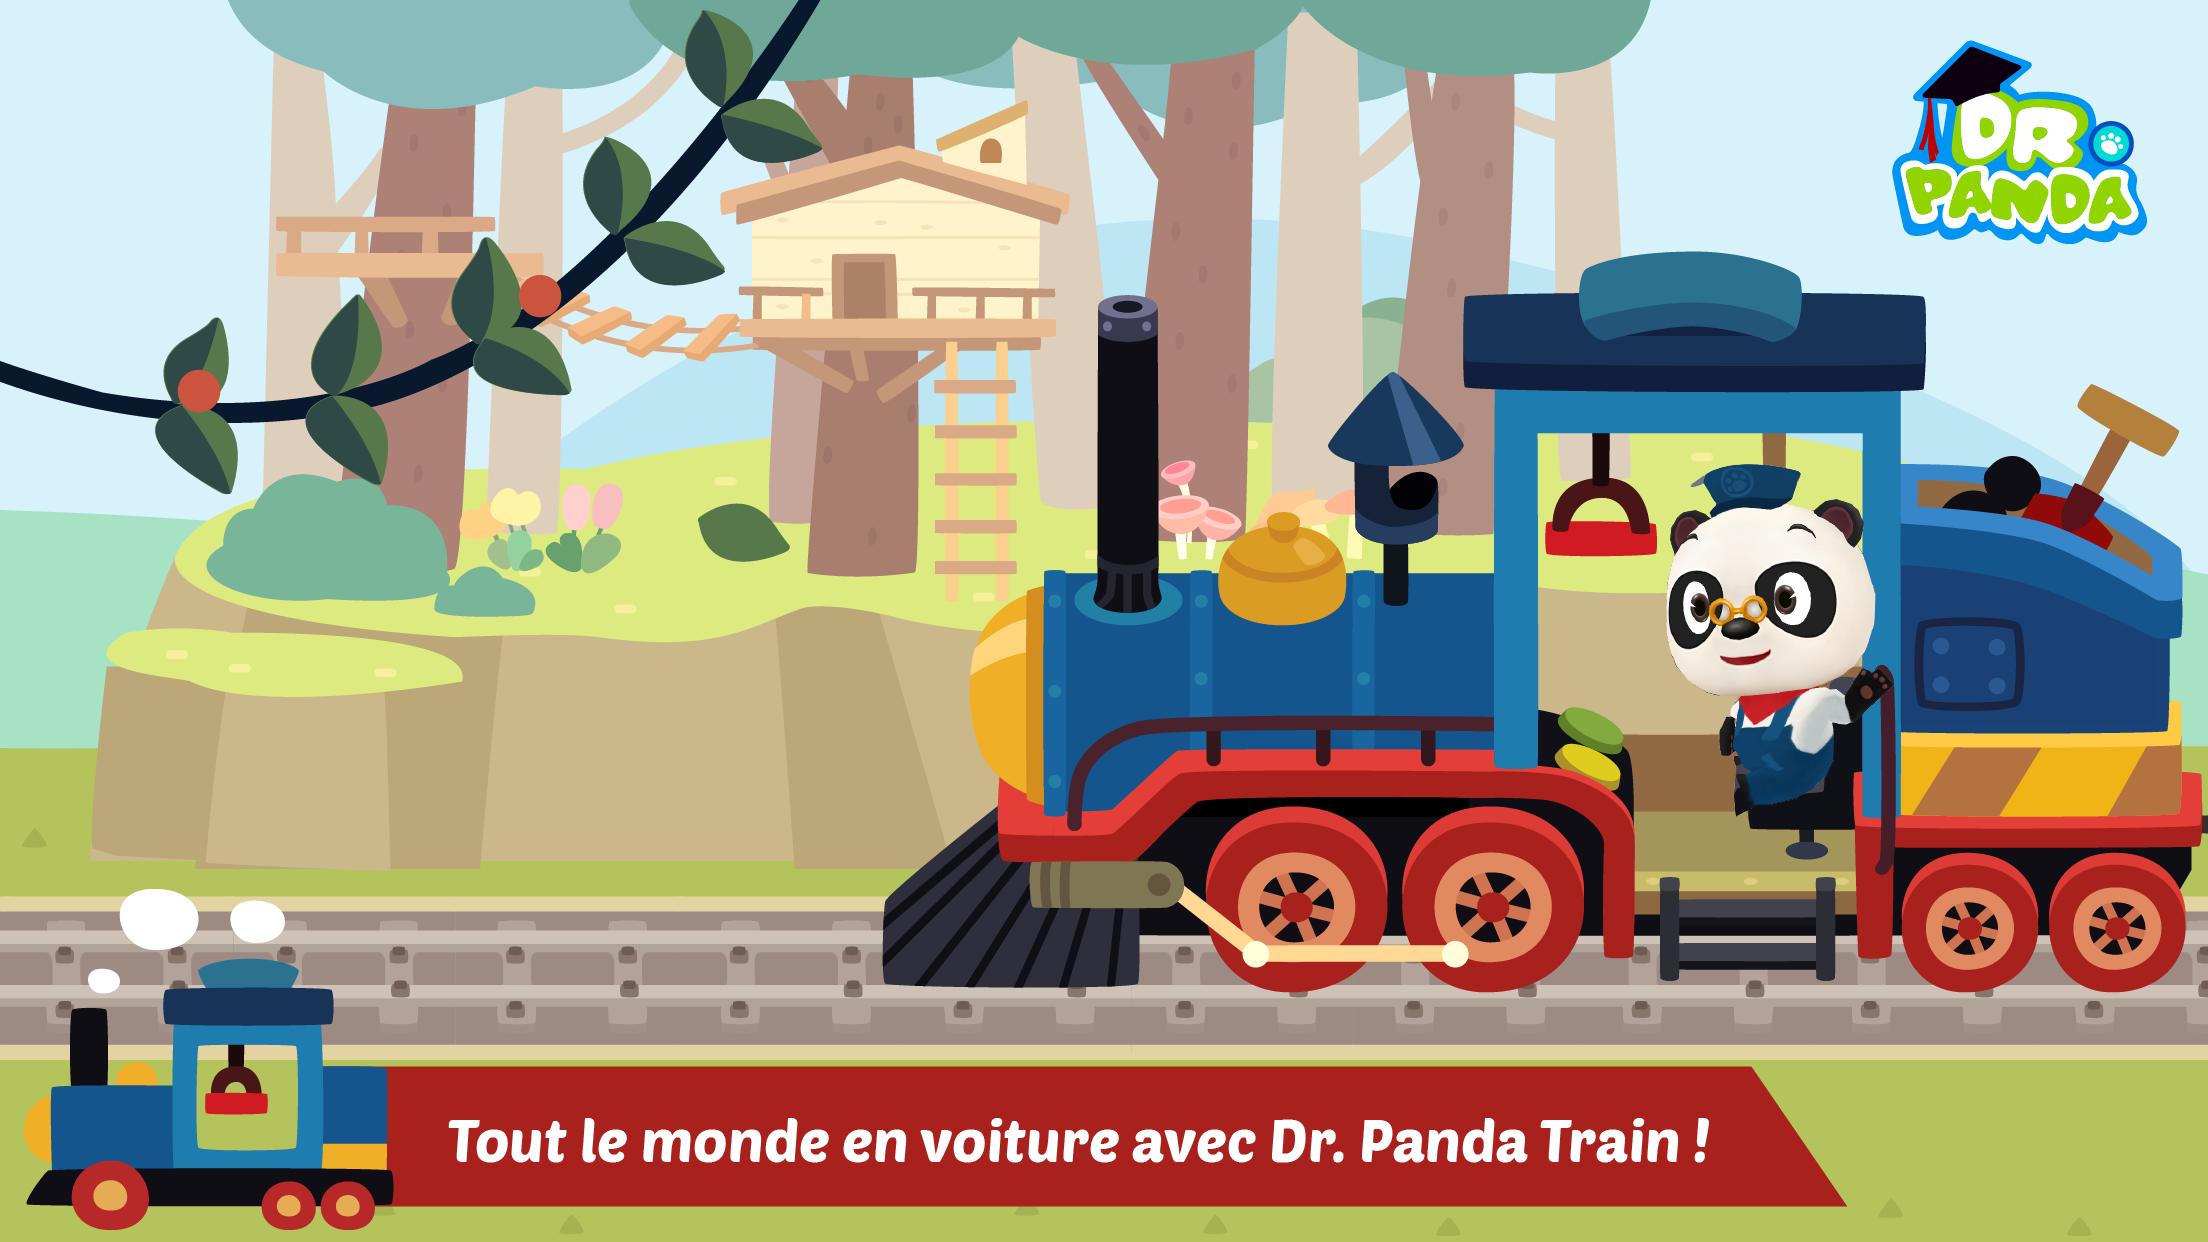 dr panda train 1